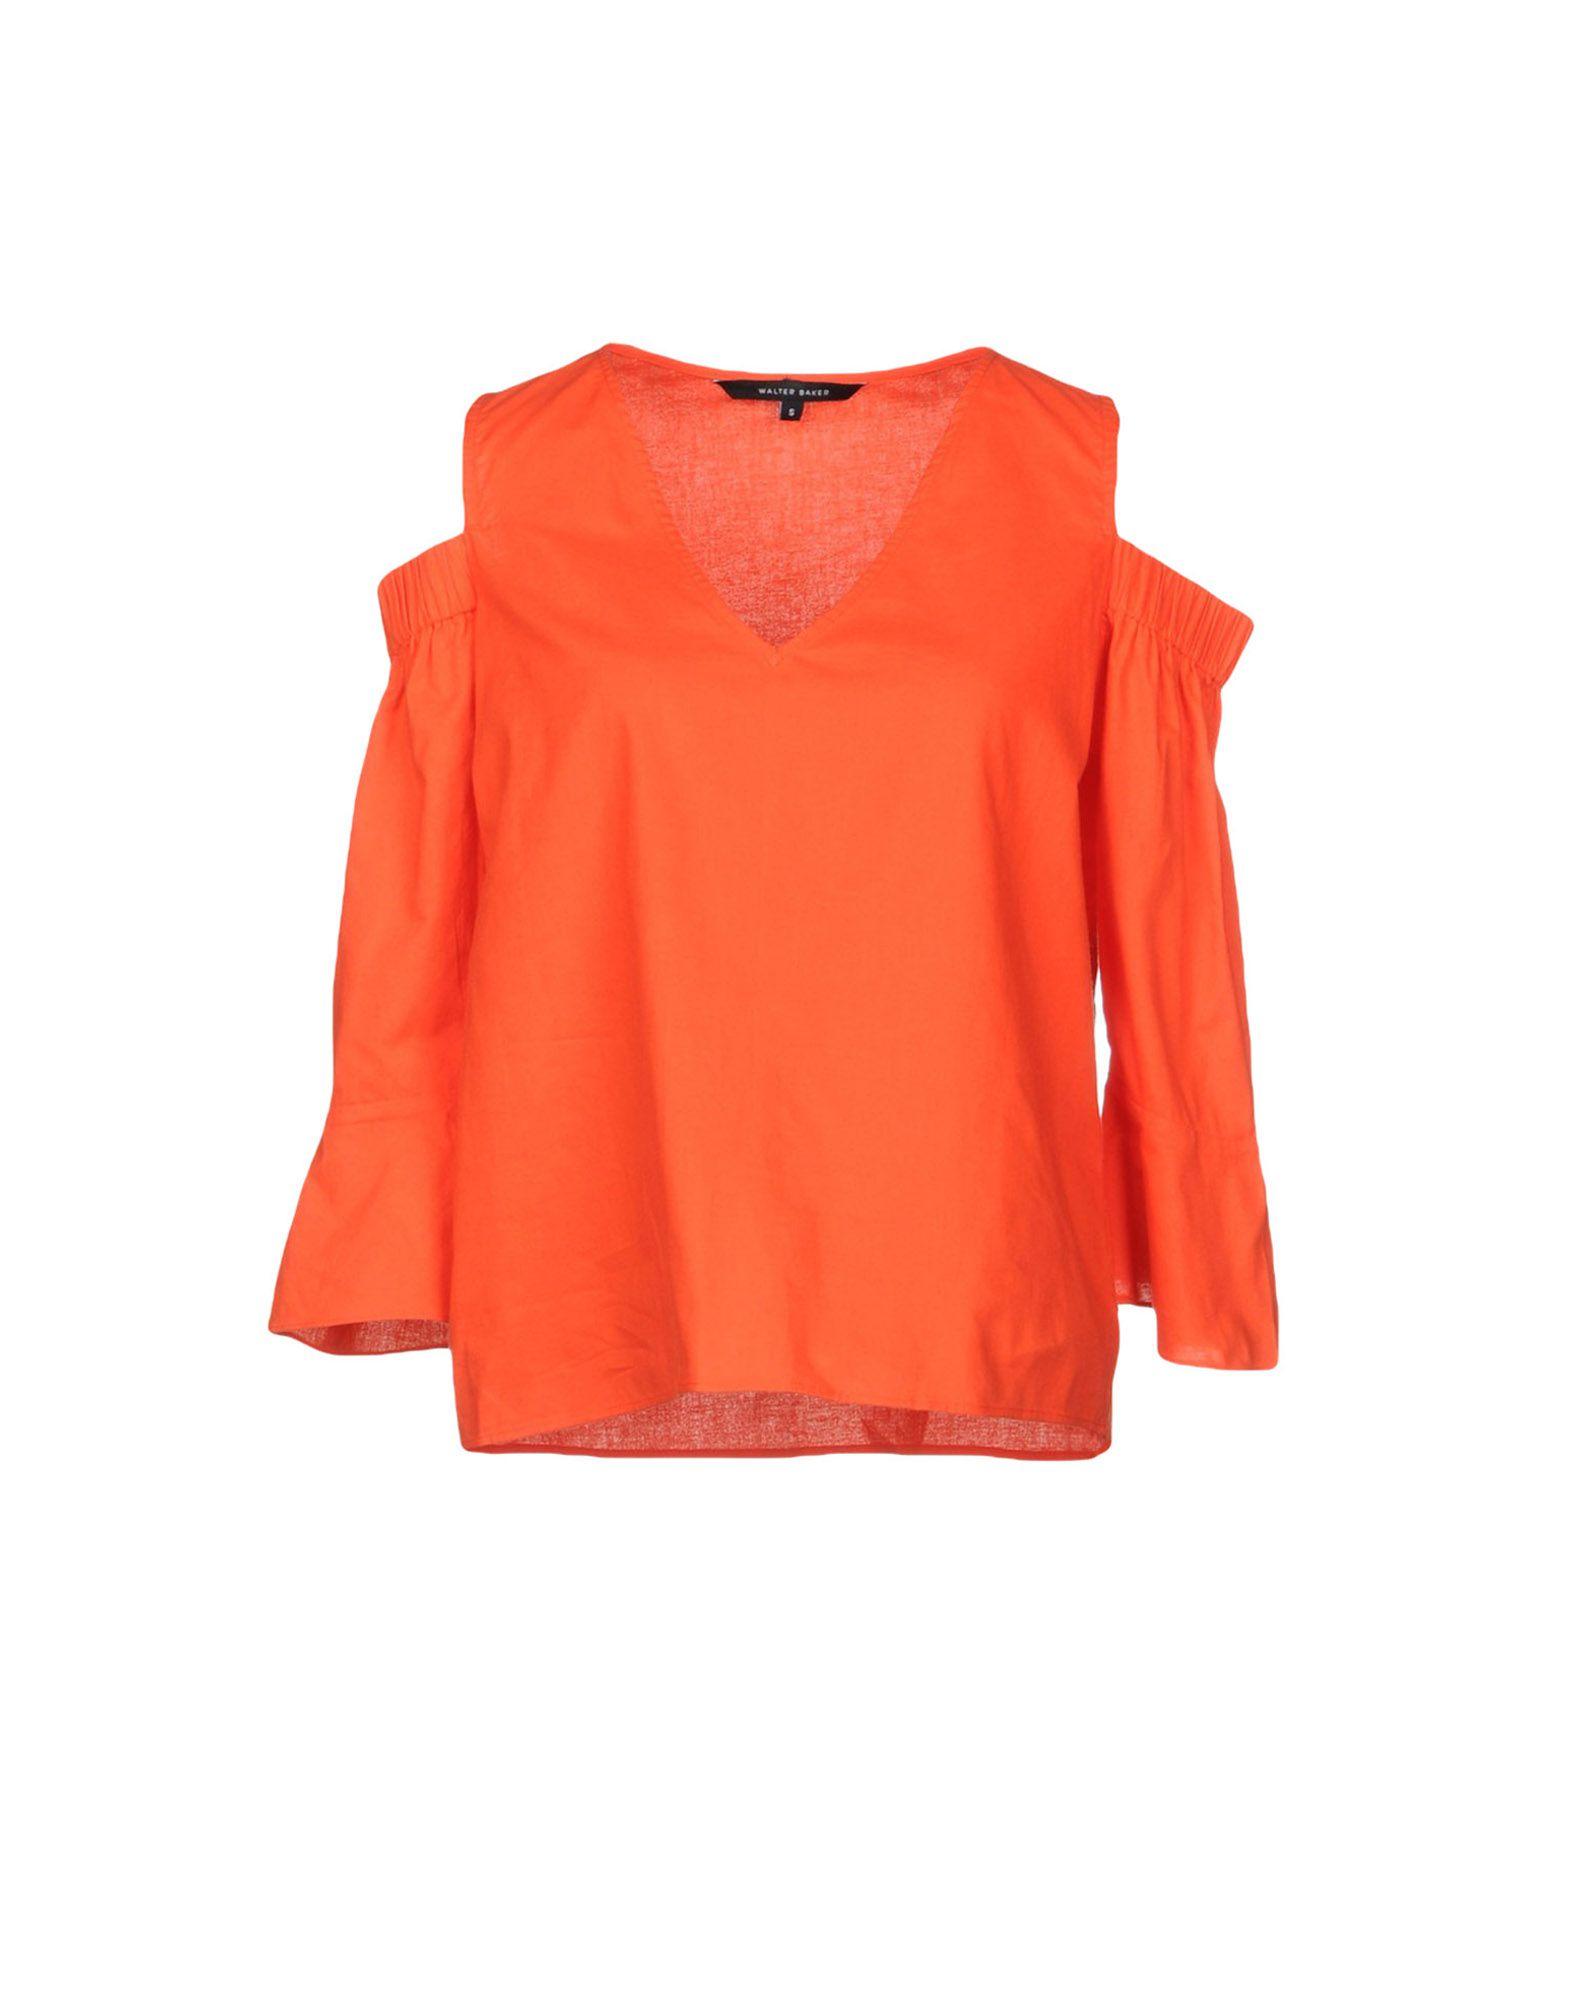 WALTER BAKER Blouse in Orange